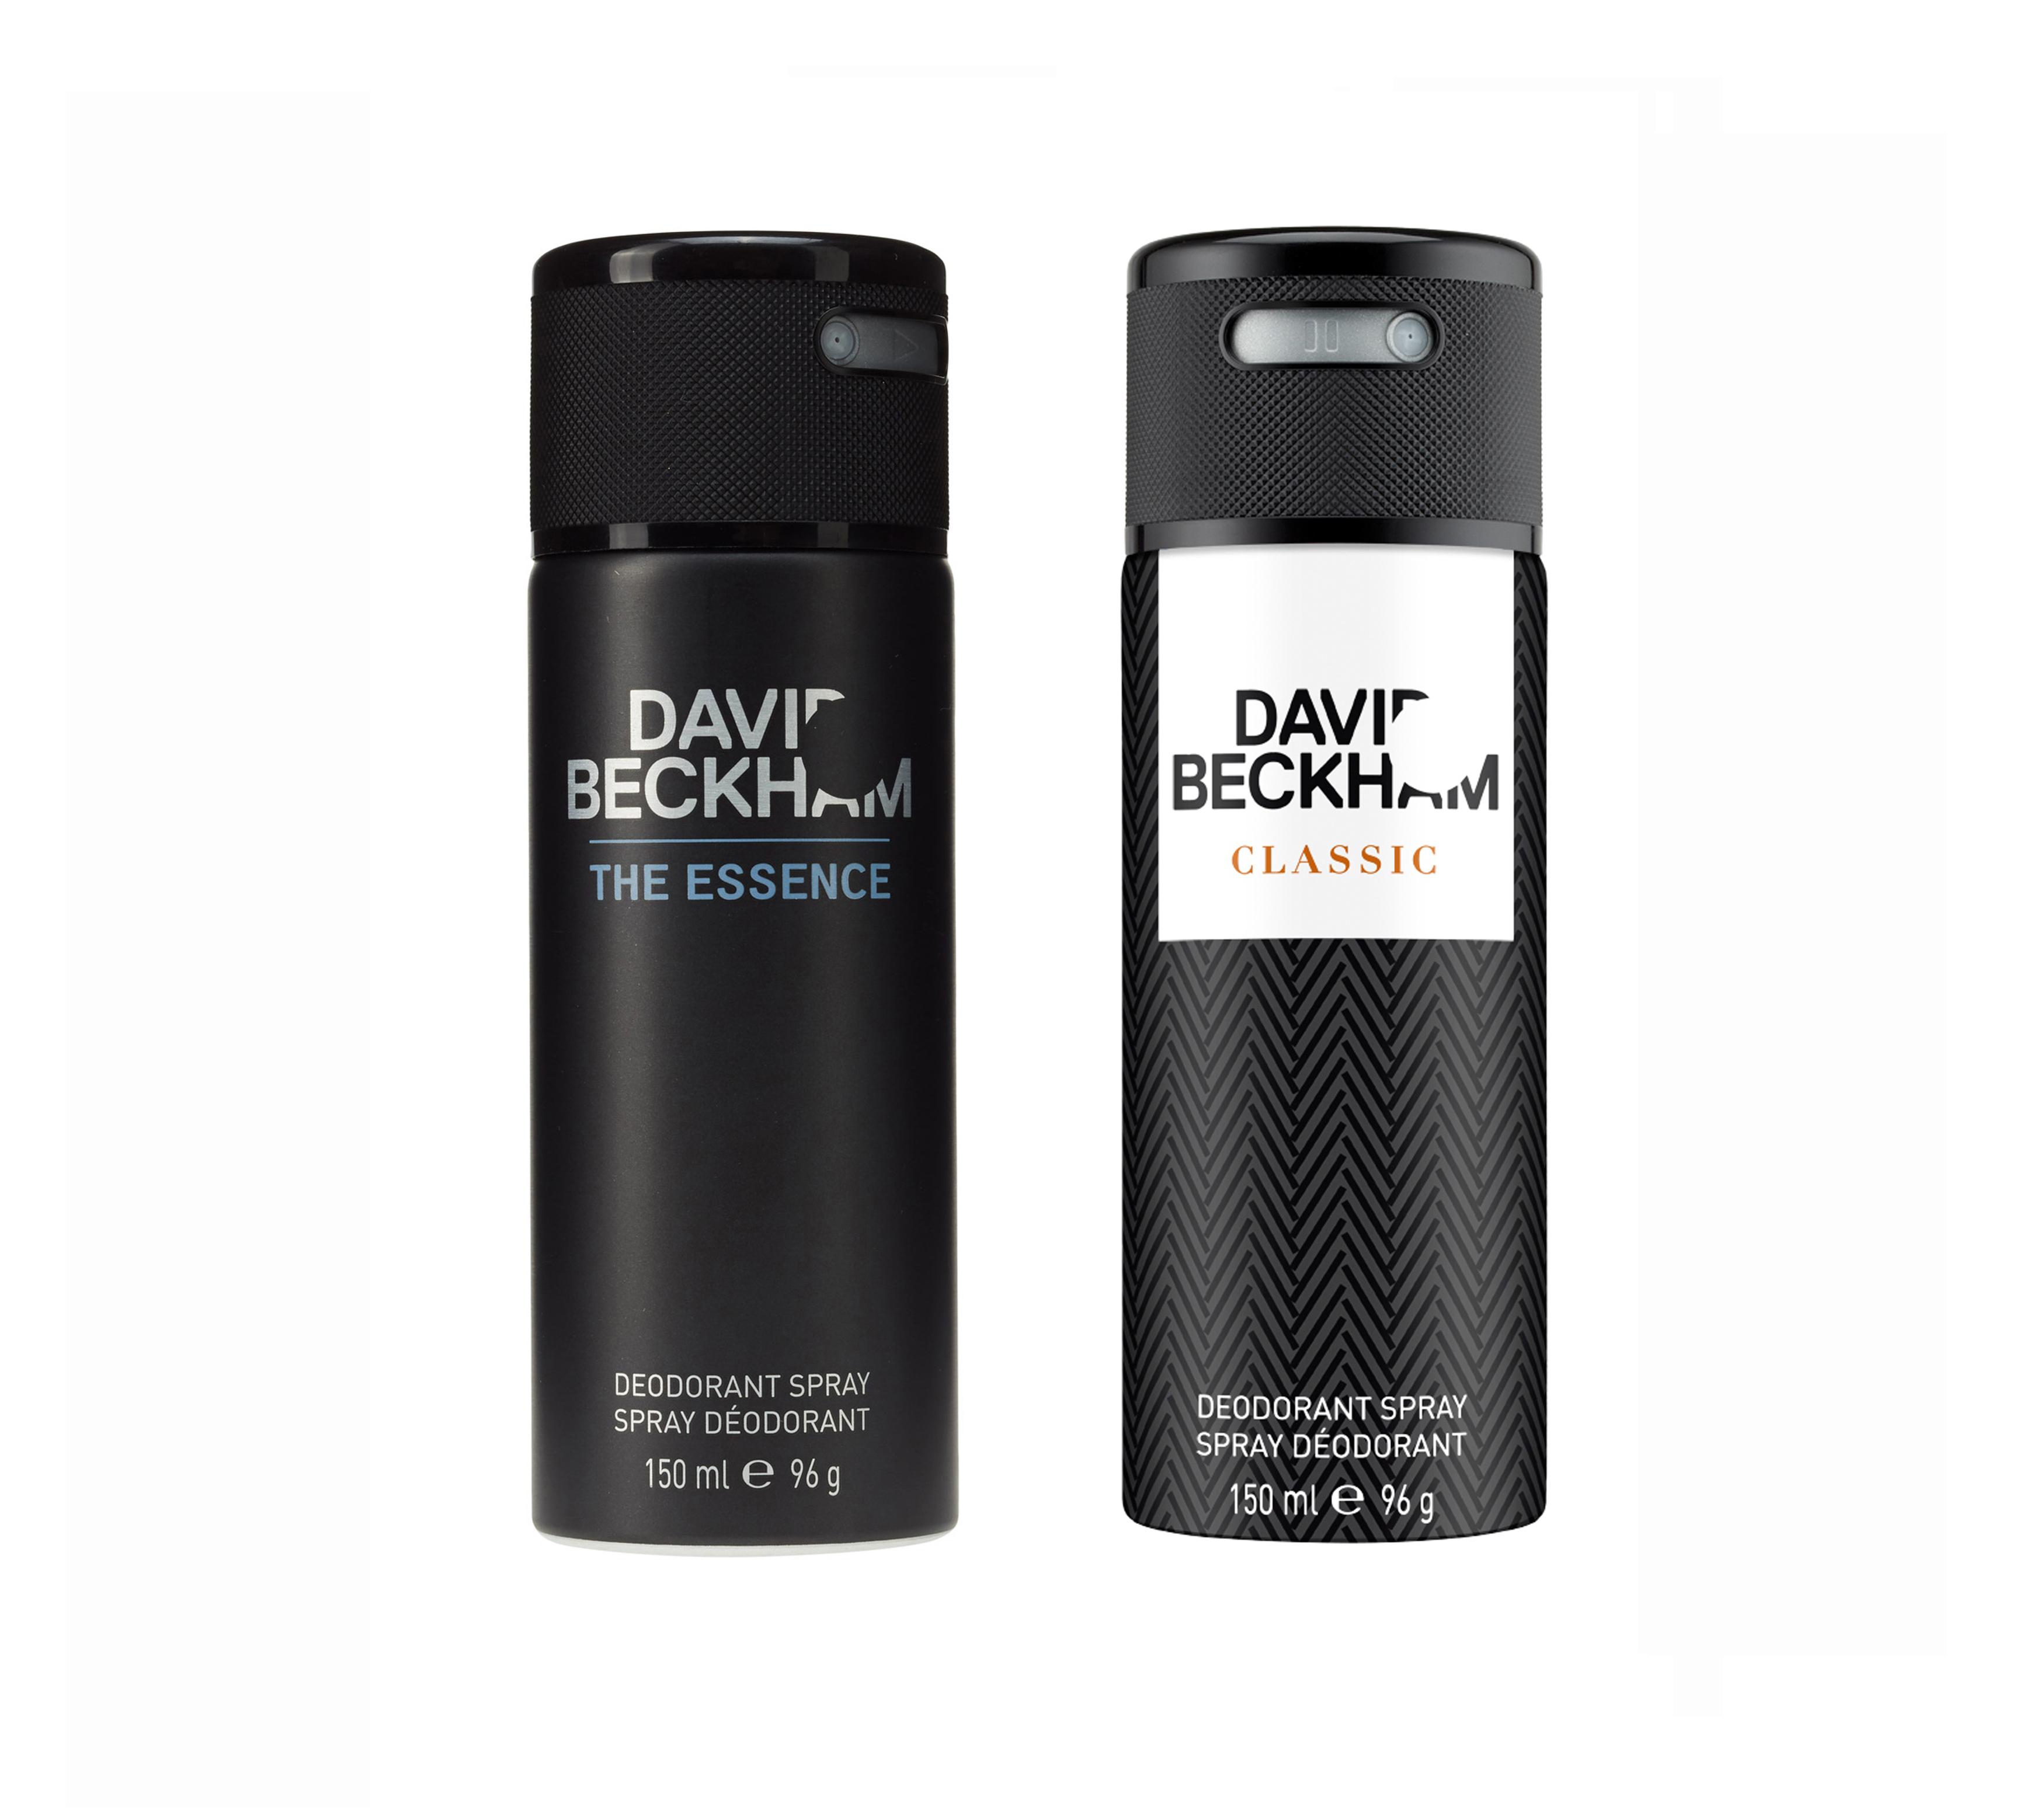 David Beckham | Essence and Classic Deo Combo Set of 2